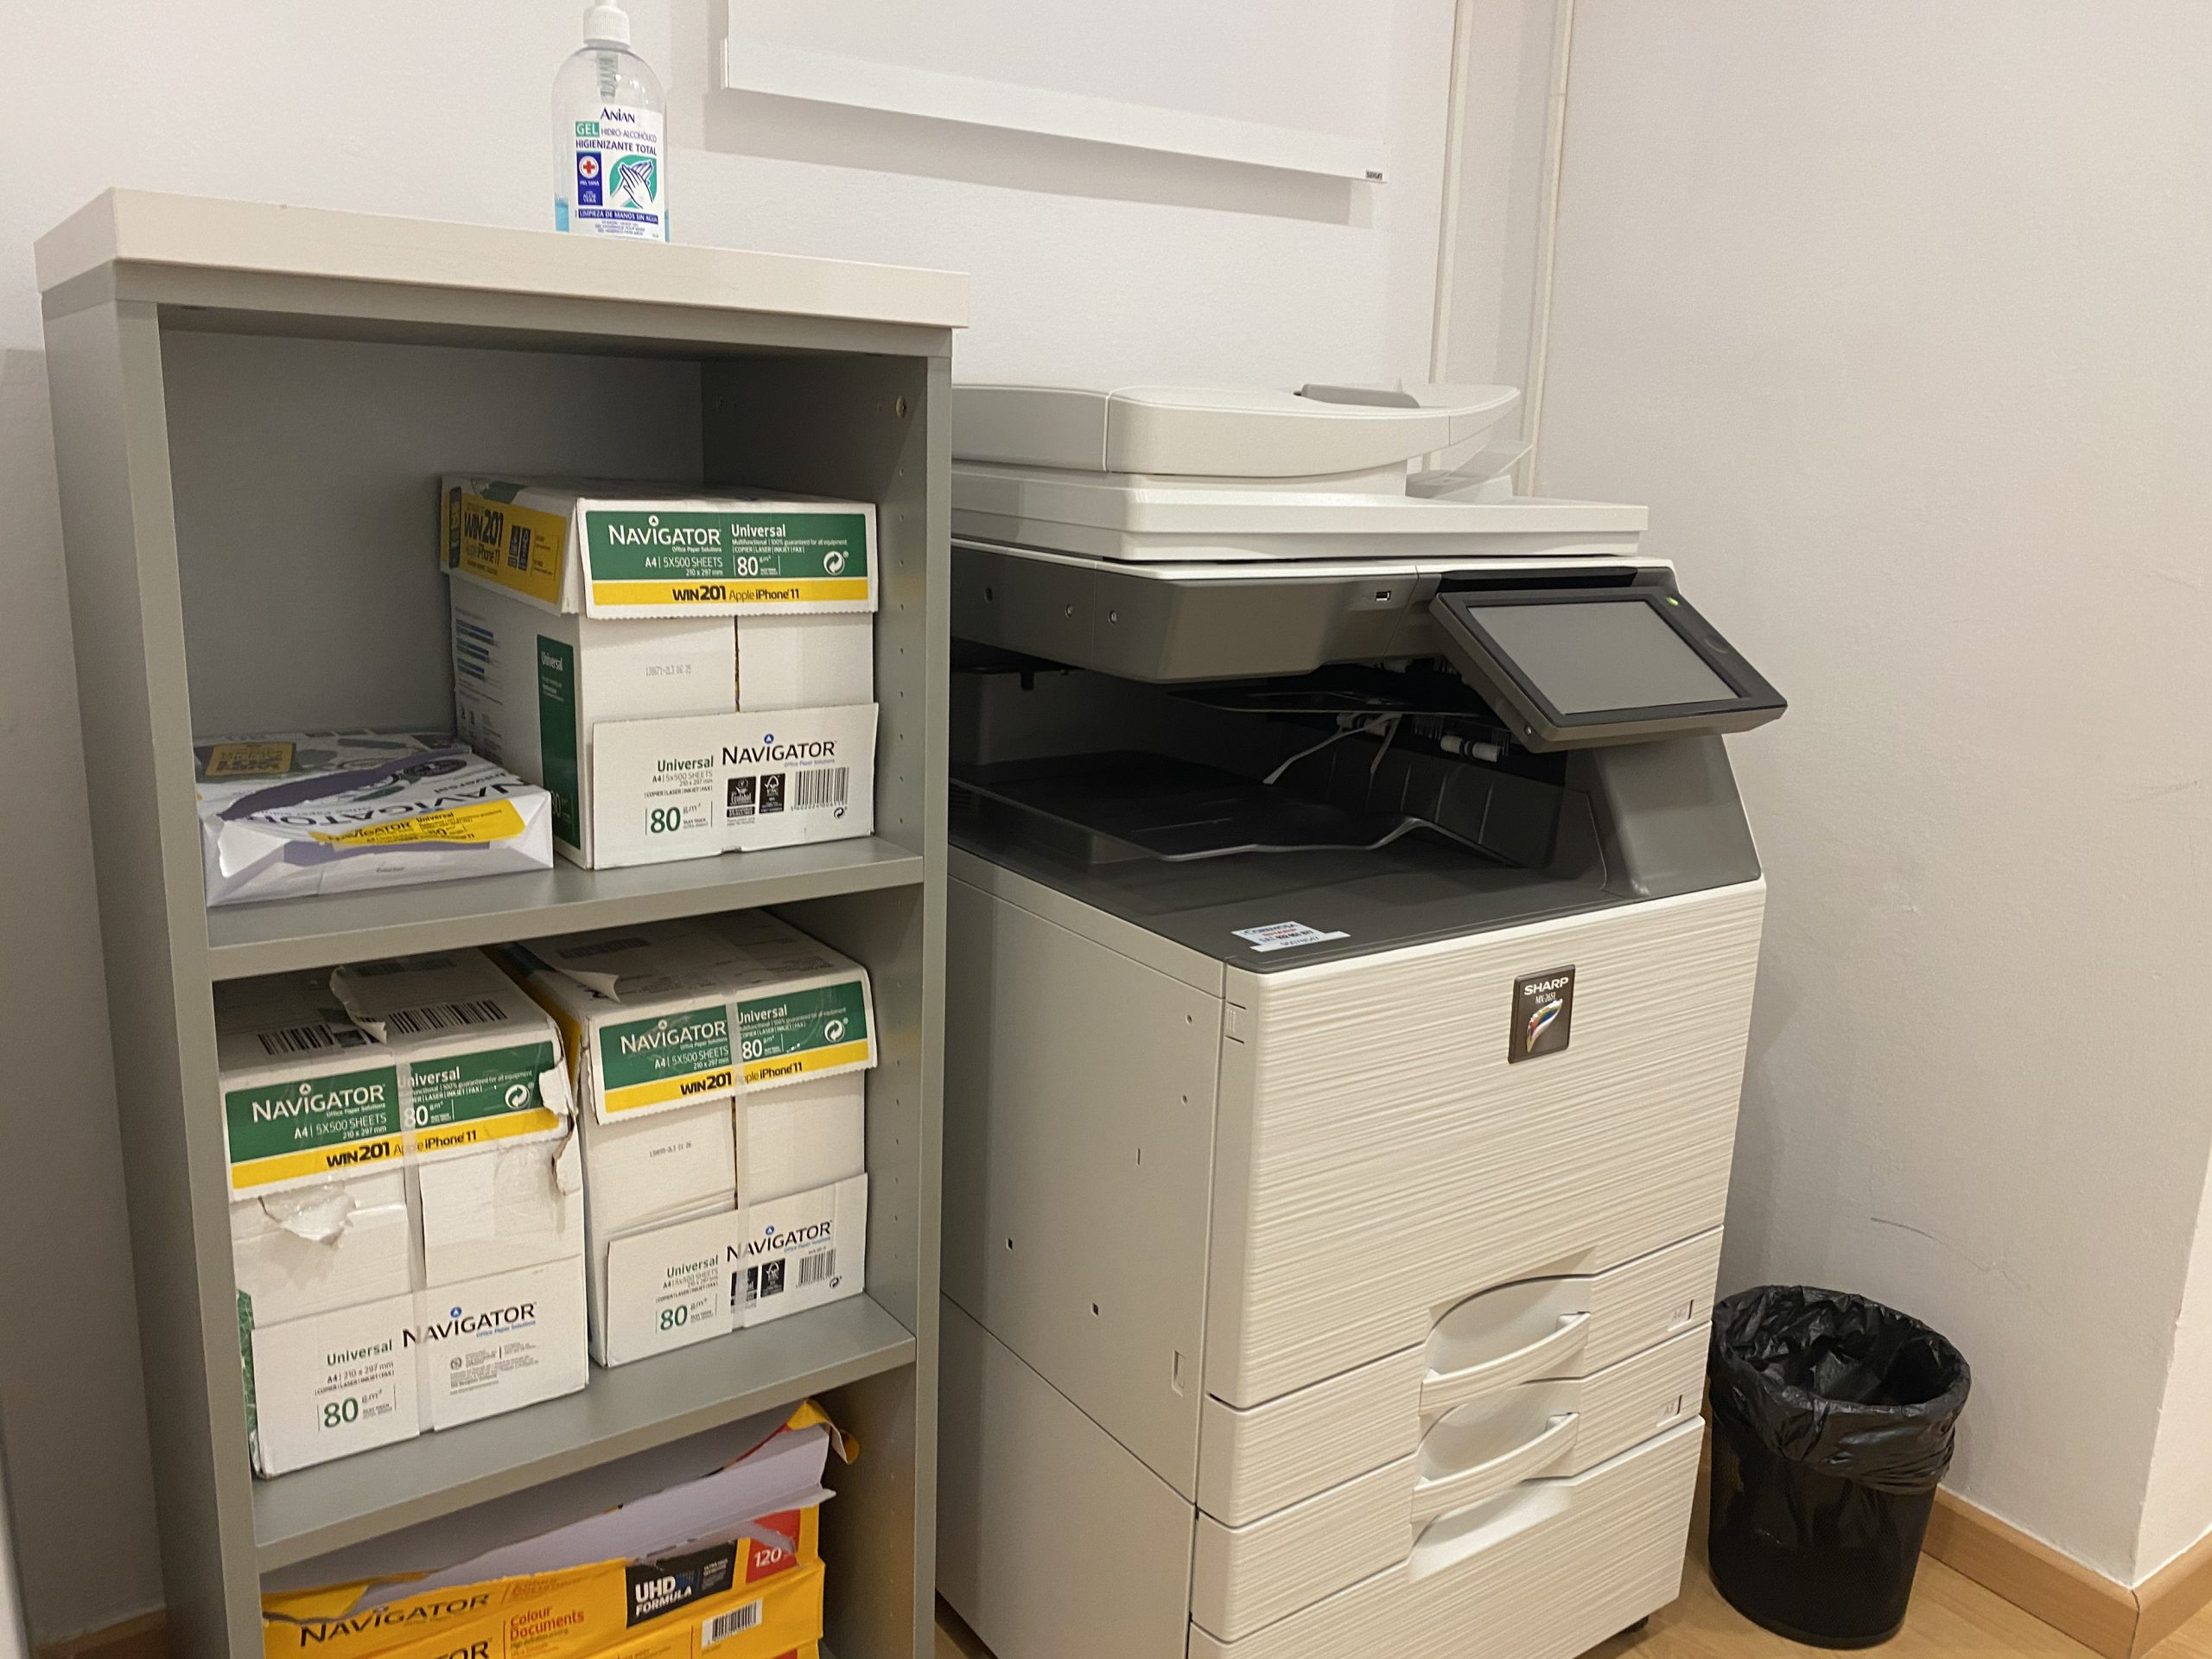 Servicio de impresión